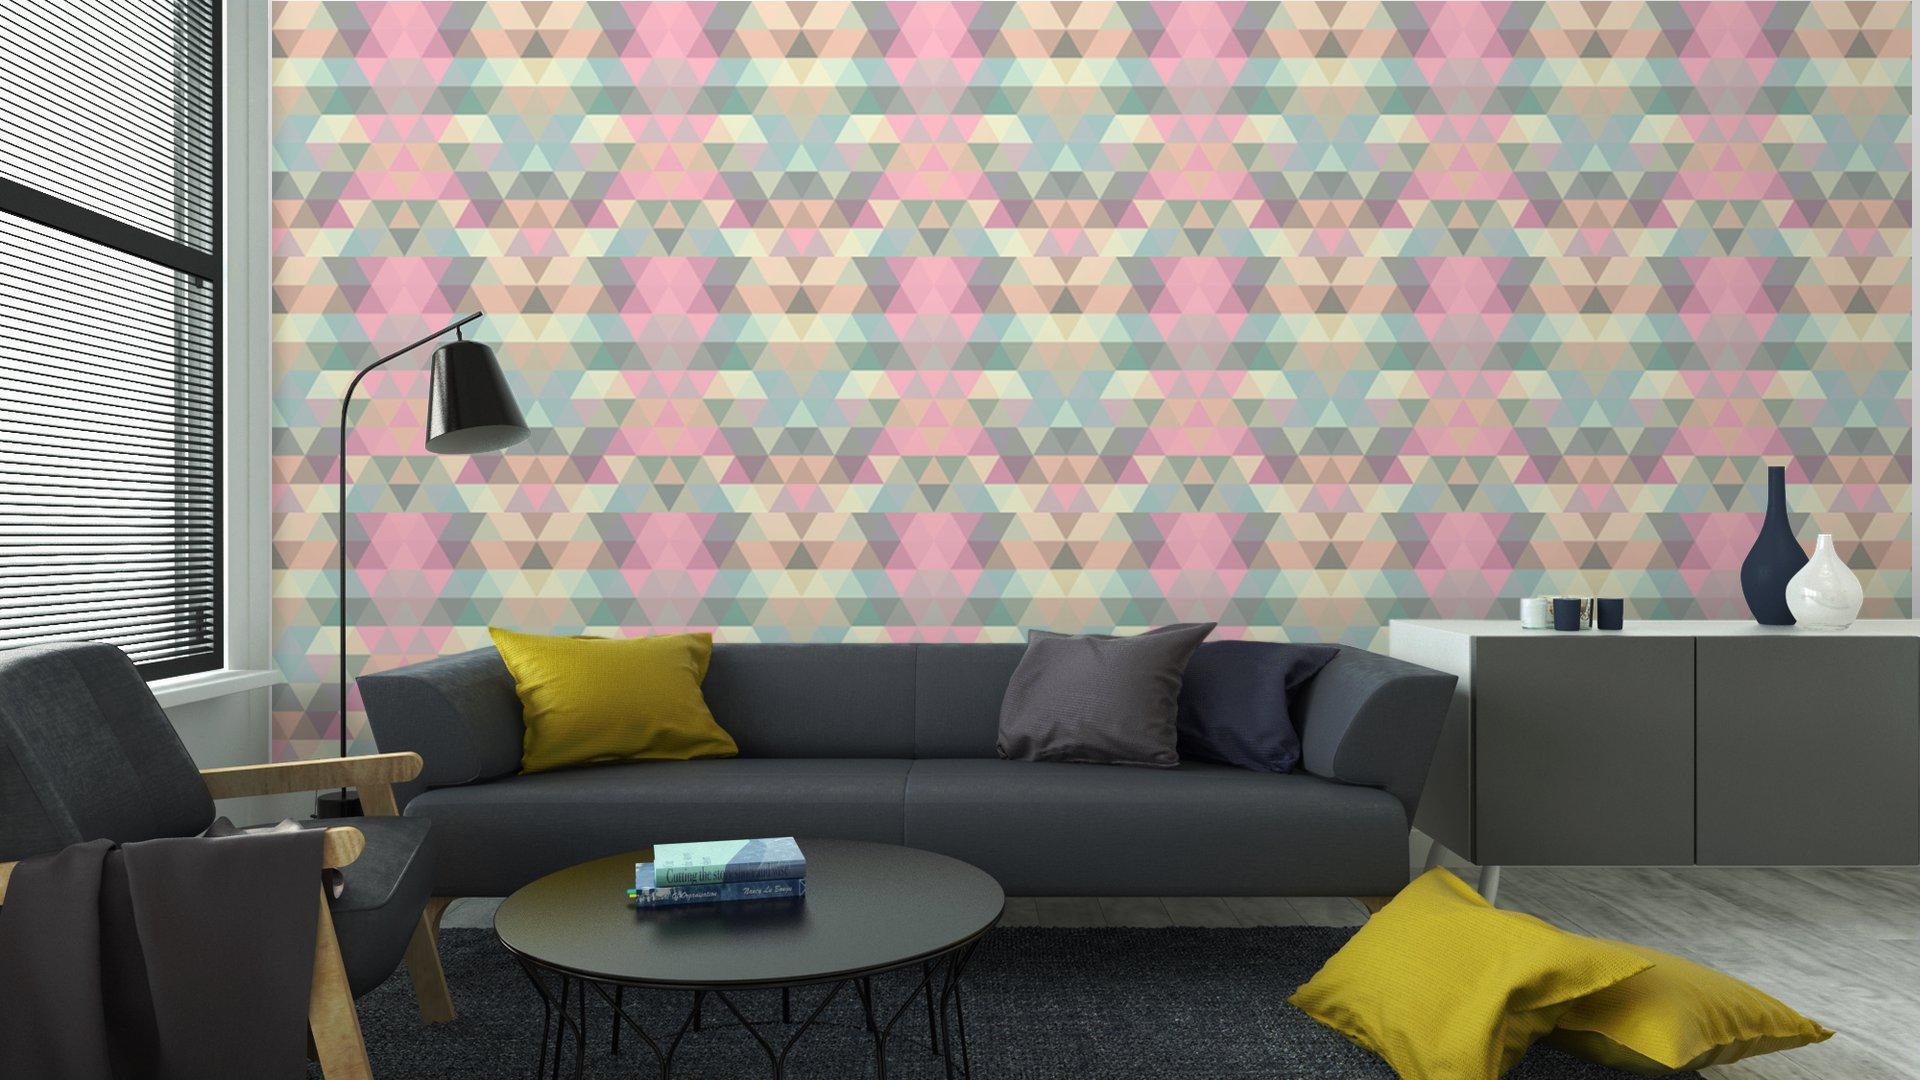 Fotomurales mexico papeles pintados lavables triangulo fondo de mosaico fondo geometrico 5 - Papel Tapiz Patrón Geométrico Triángulo 04